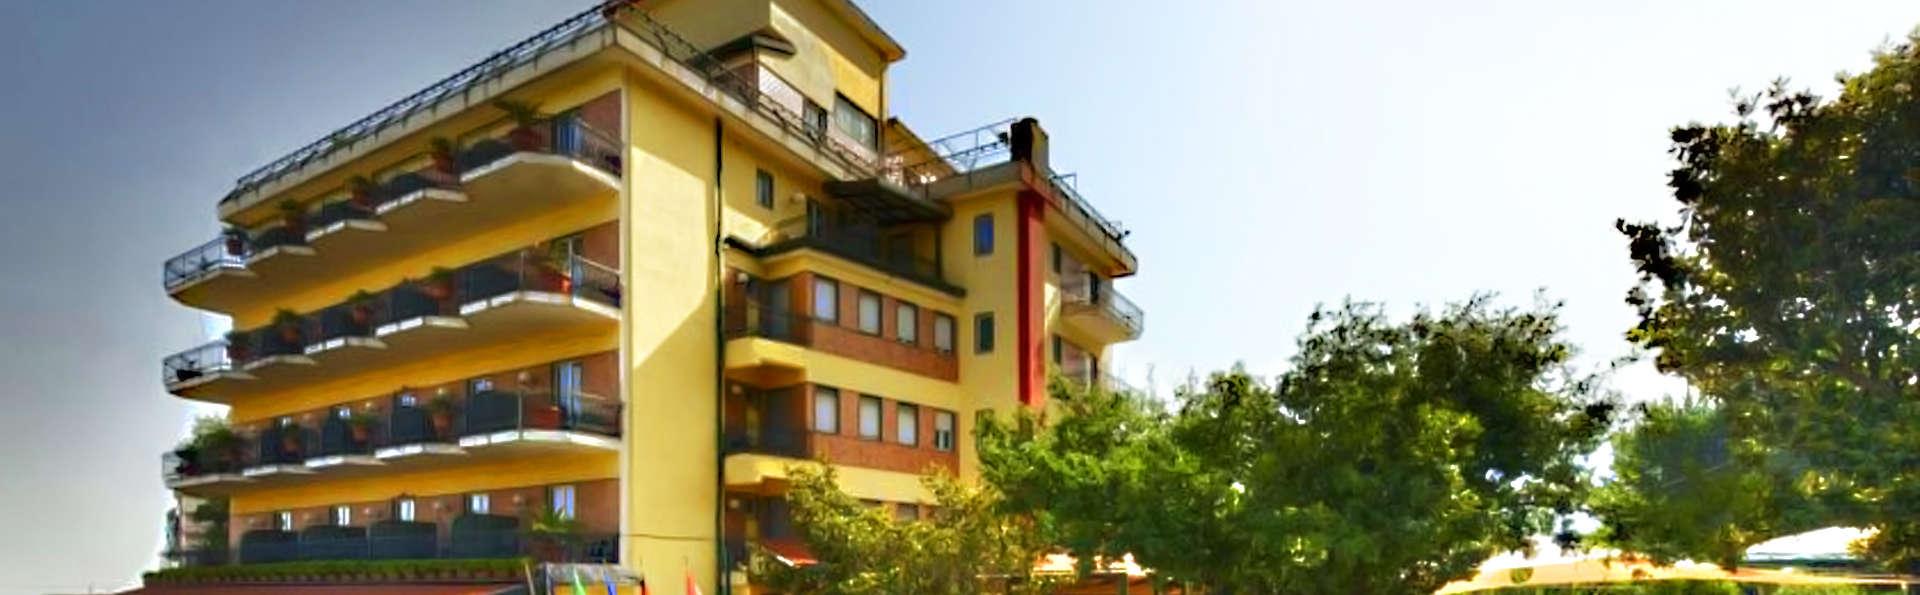 Hotel Parco - edit_front.jpg